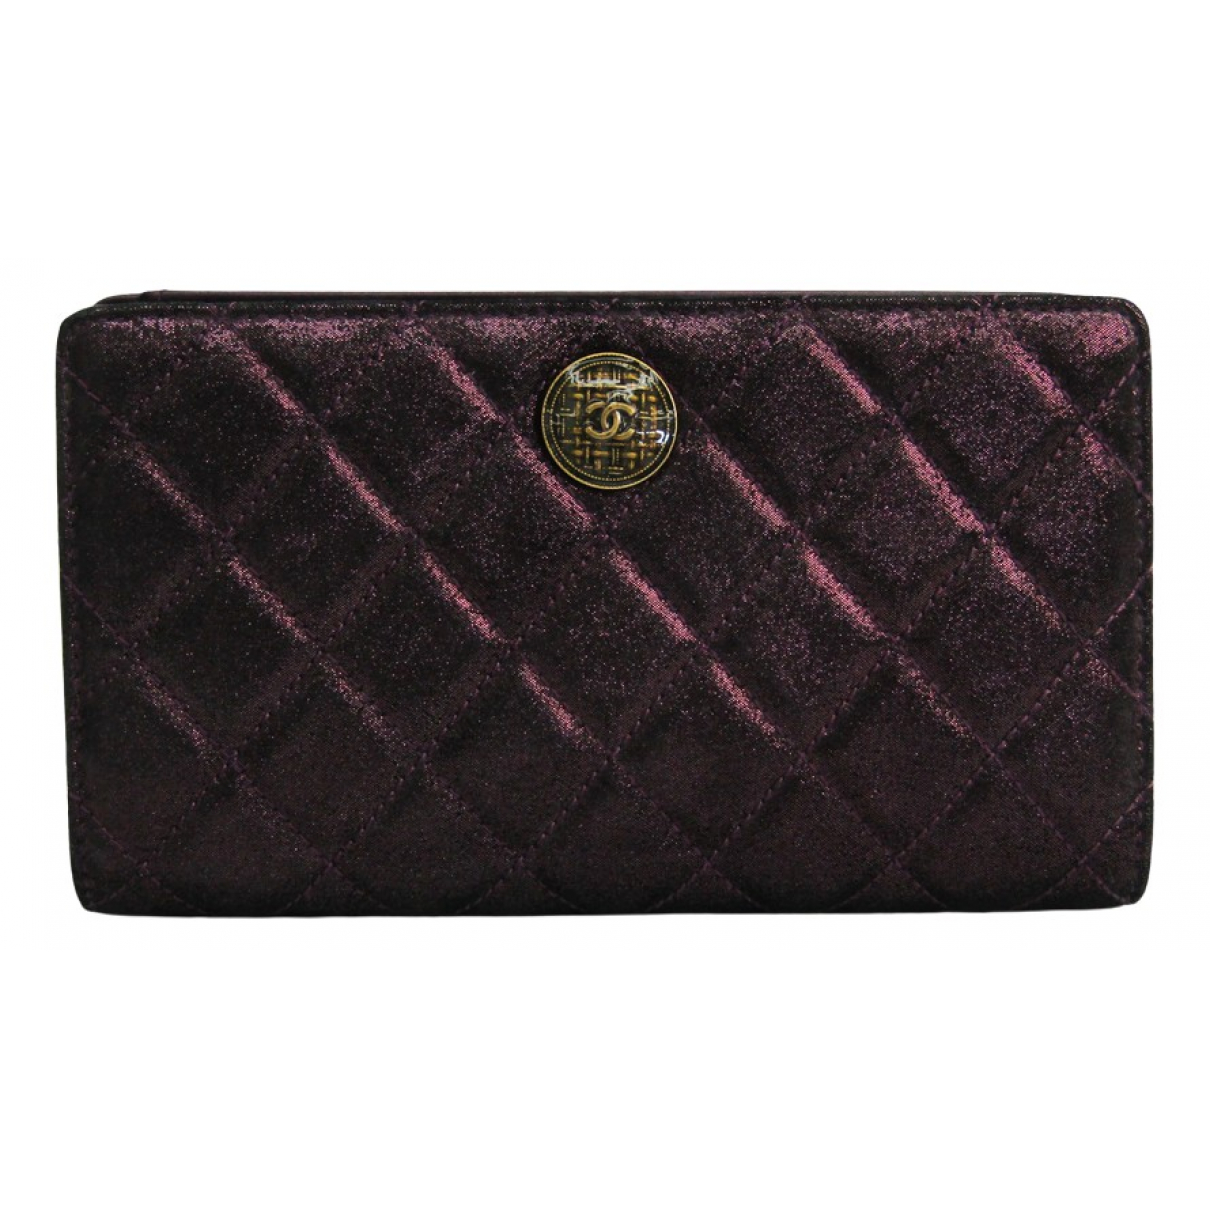 Chanel \N Portemonnaie in  Lila Leinen